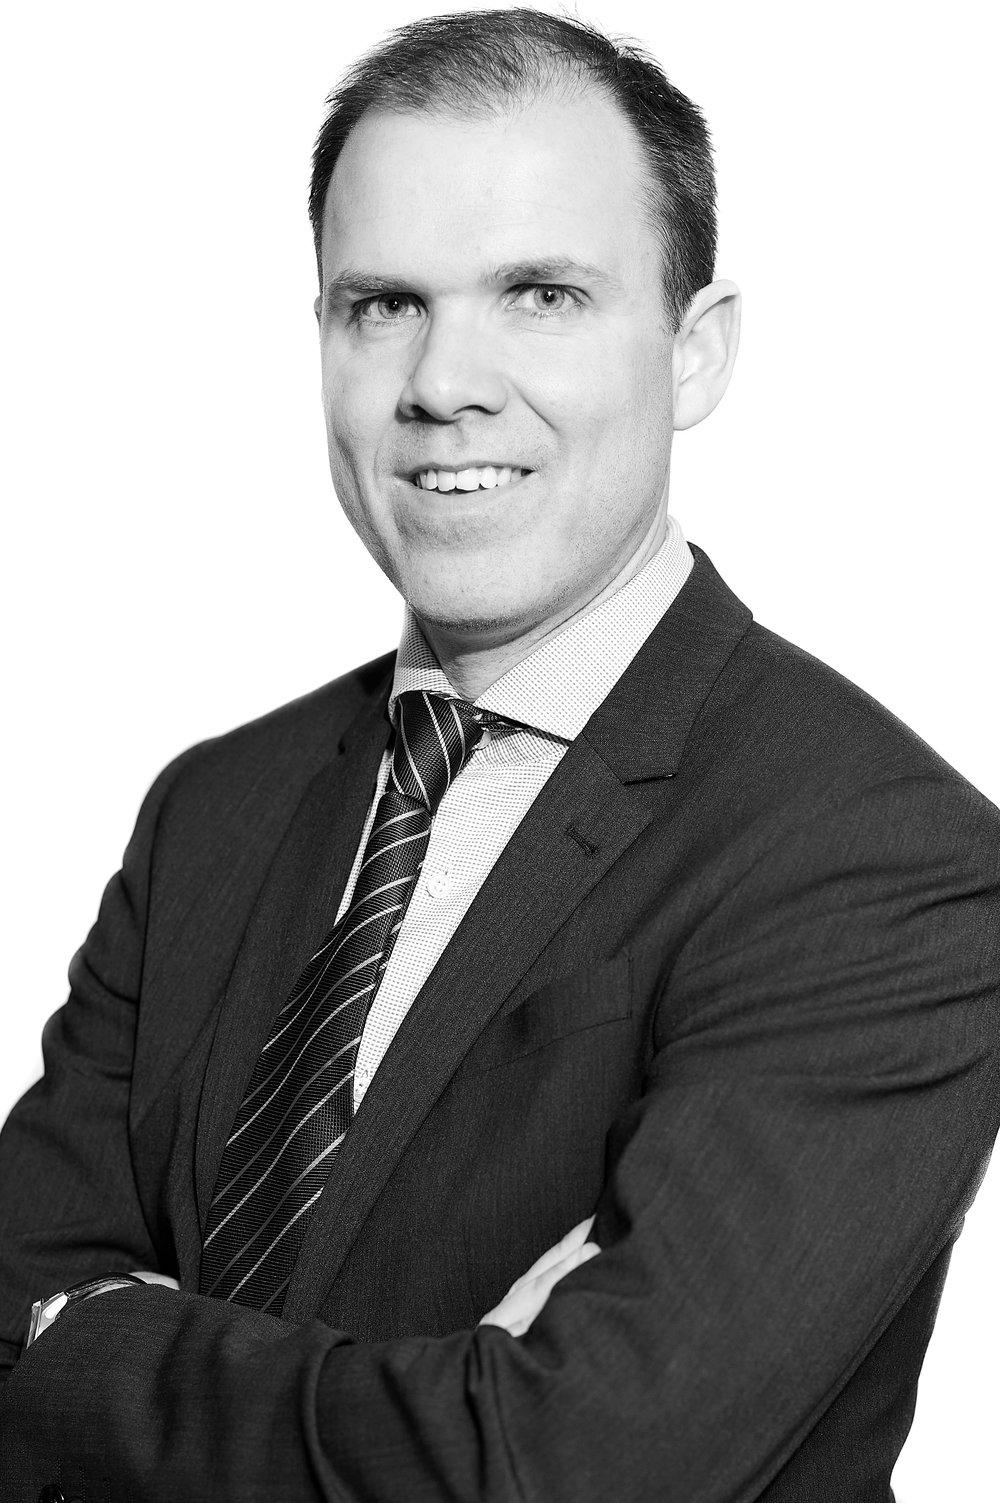 Torstein Storækre   Styreleder Epost: torstein.storaekre@akerasa.com